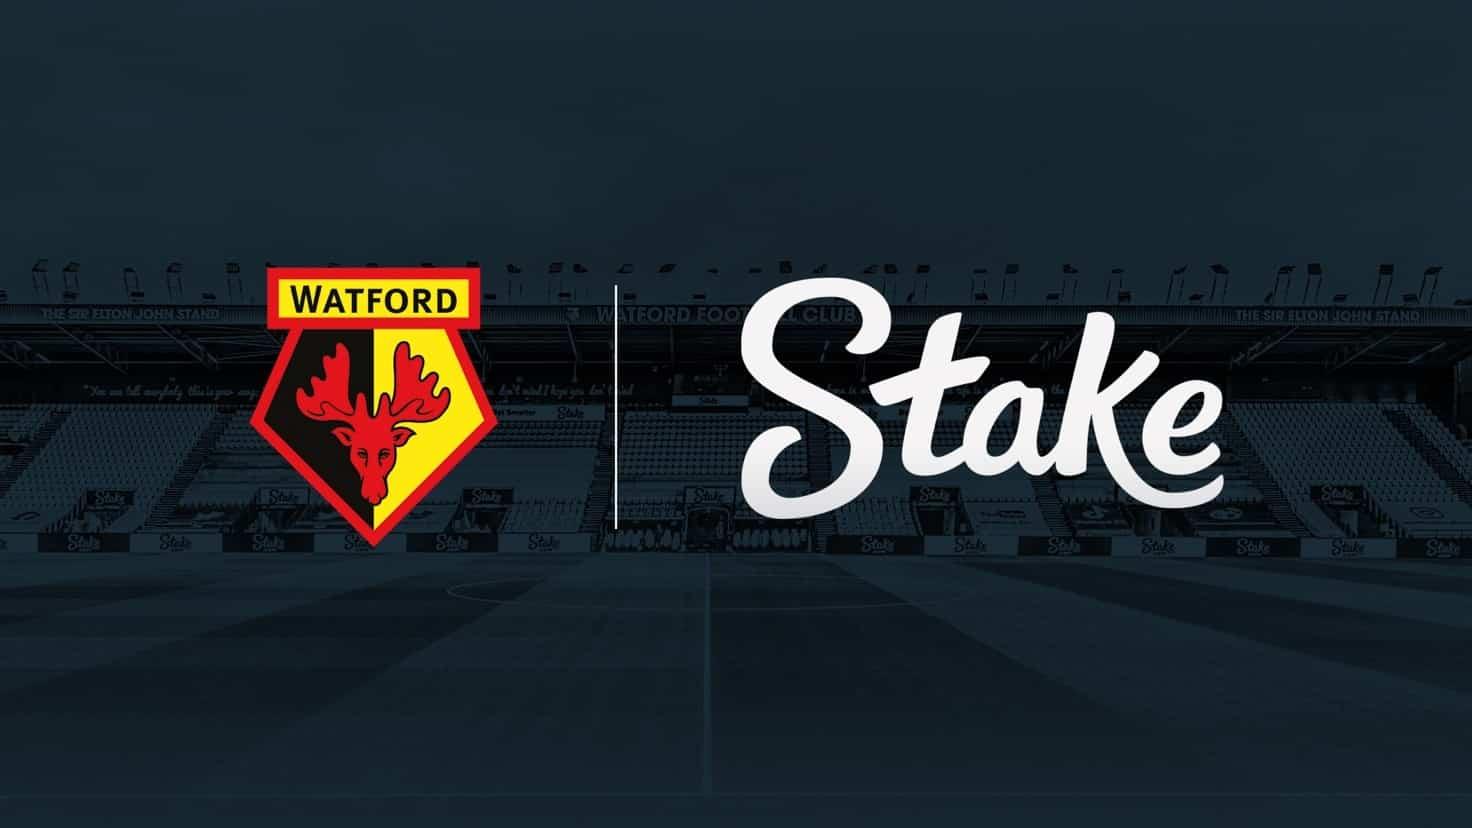 Watford stake.com